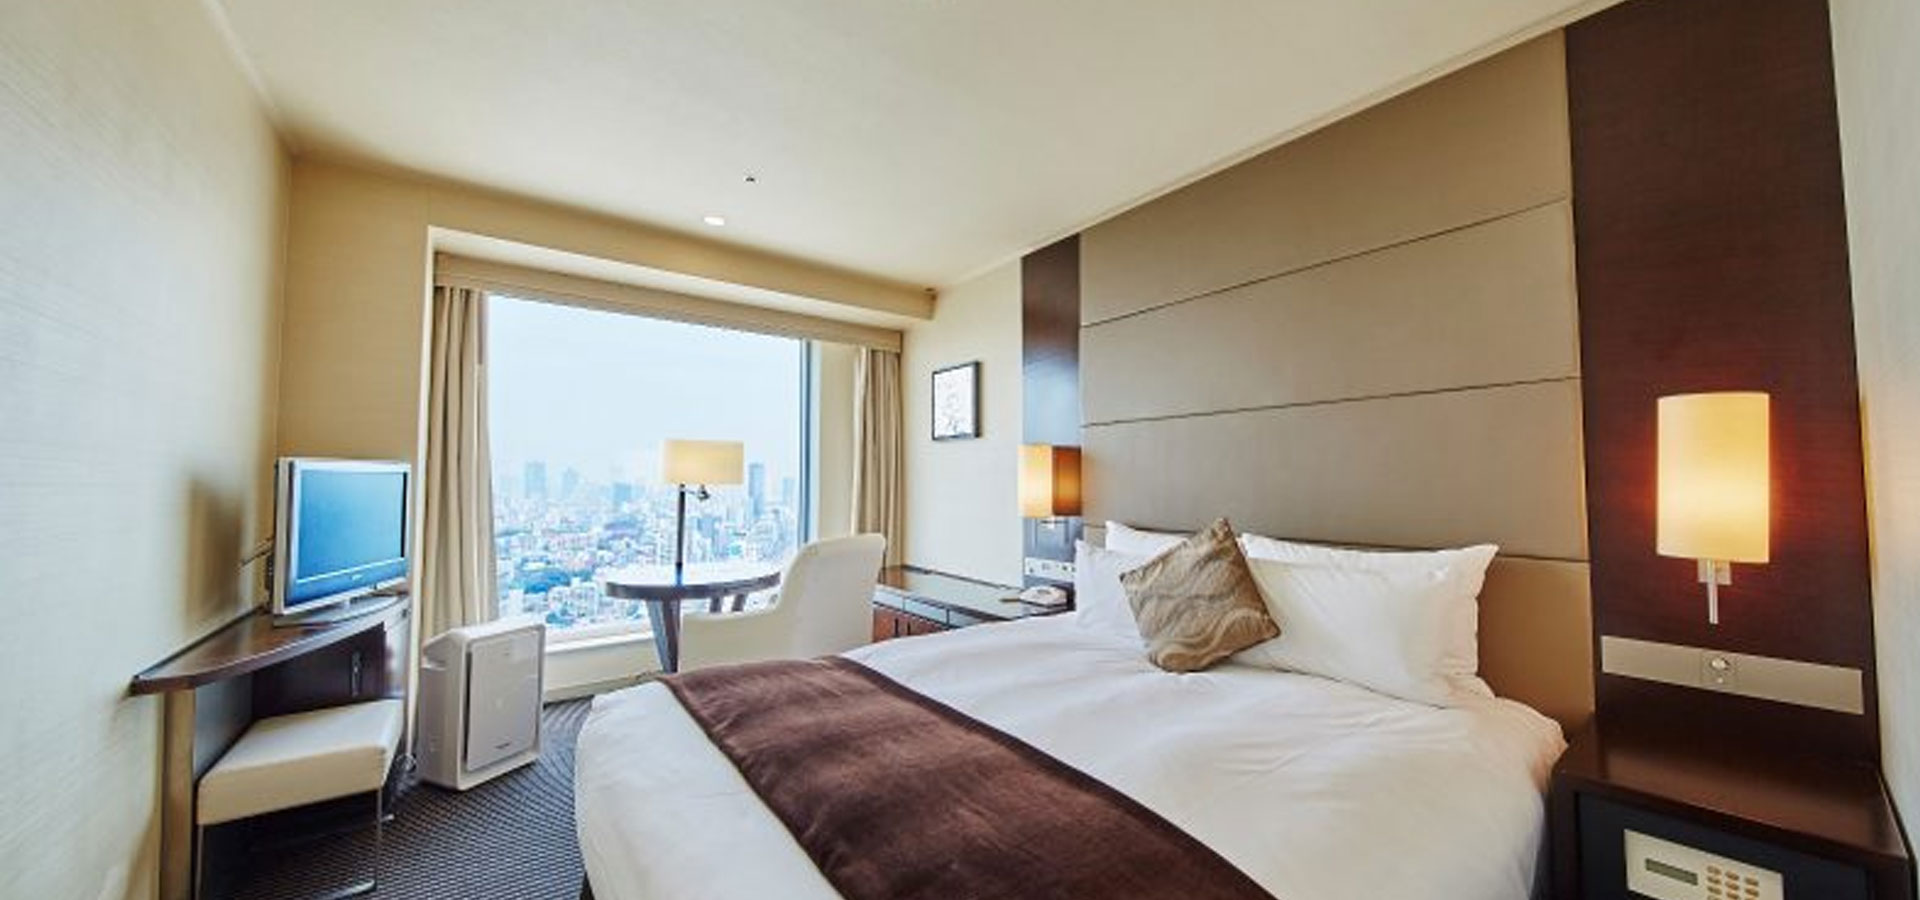 Double Room (35th – 37th floors)